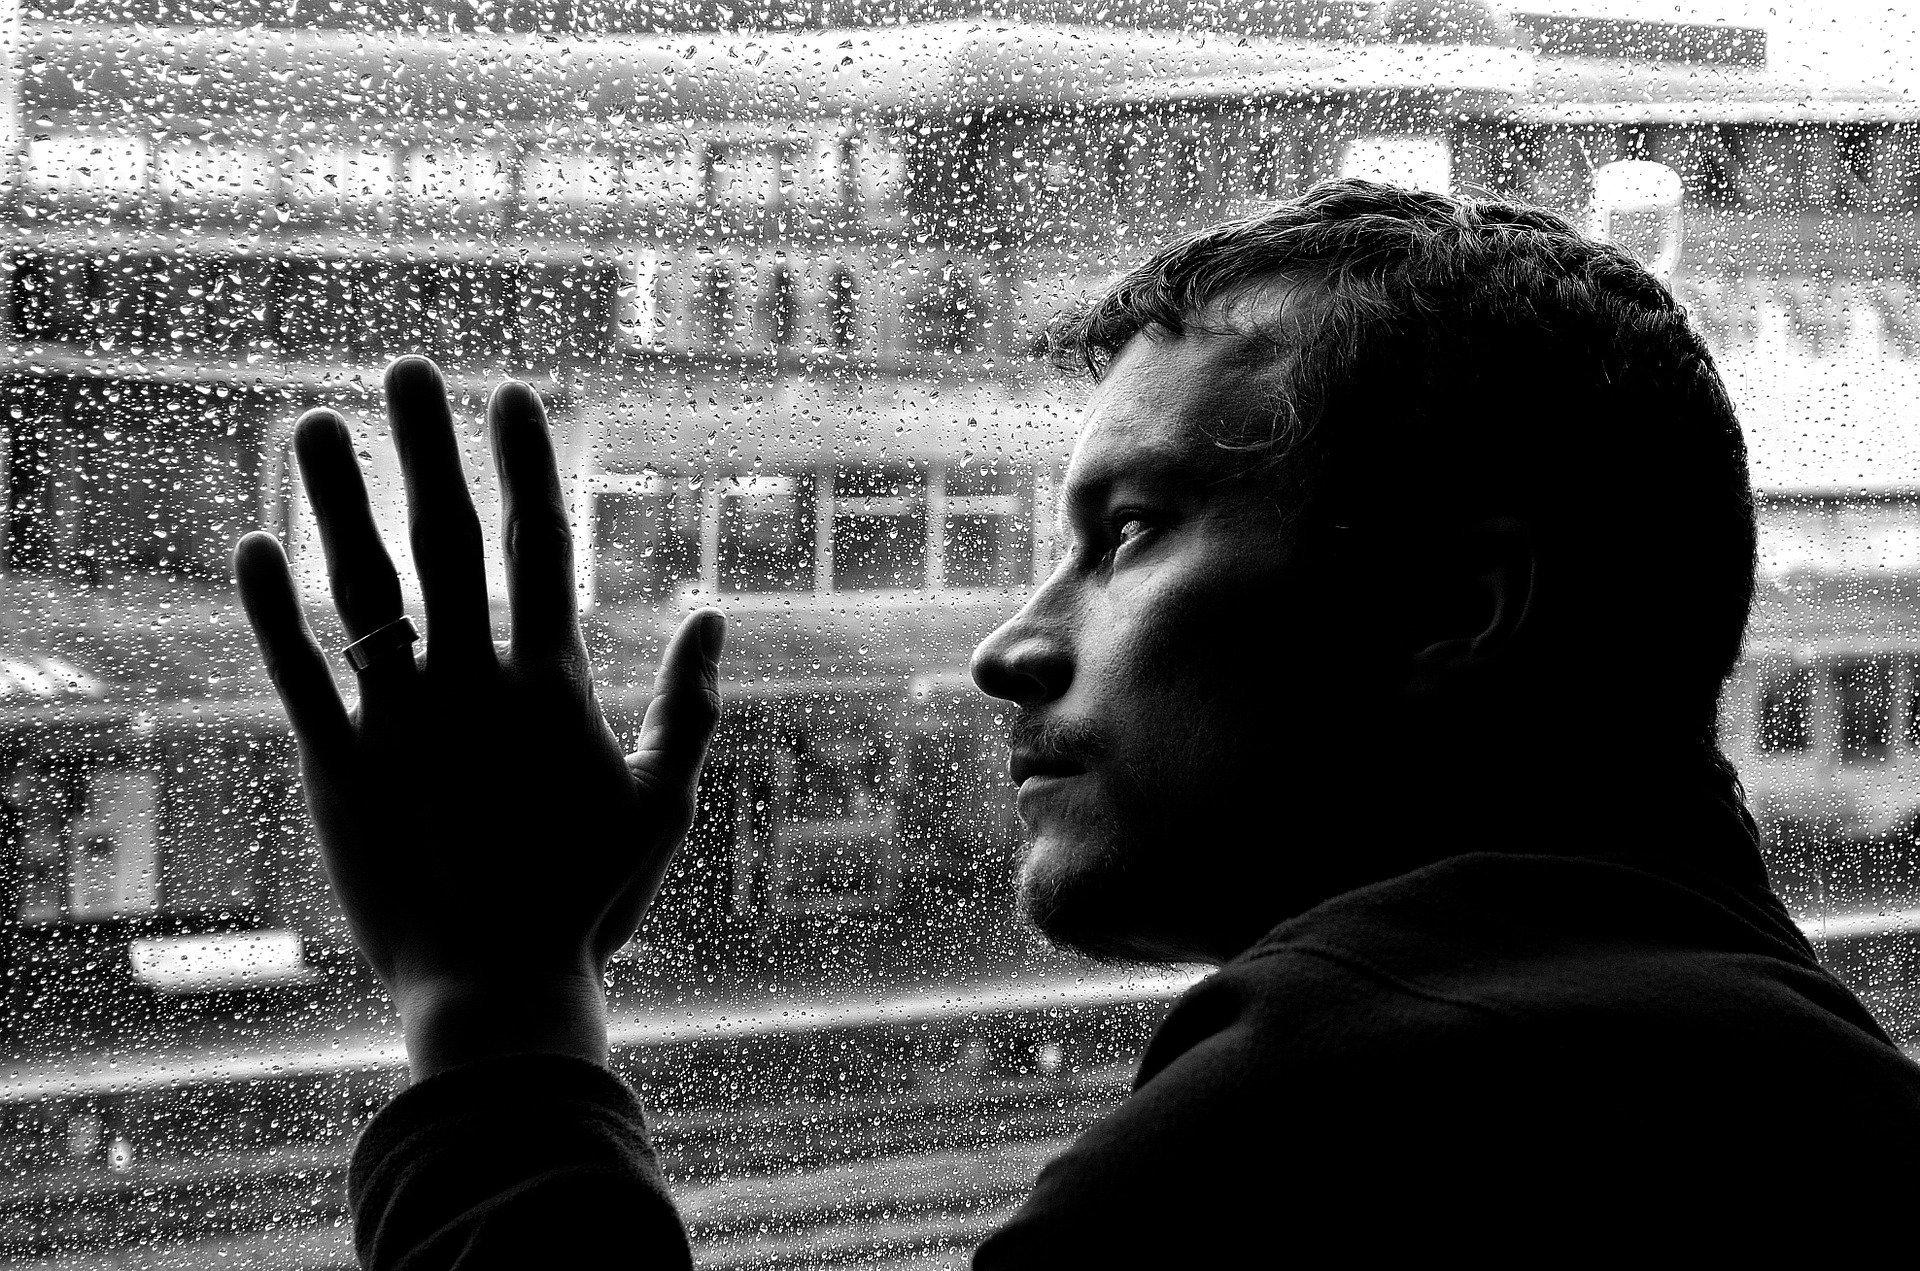 Personalized Brain Stimulation Alleviates Severe Depression Symptoms - Neuroscience News